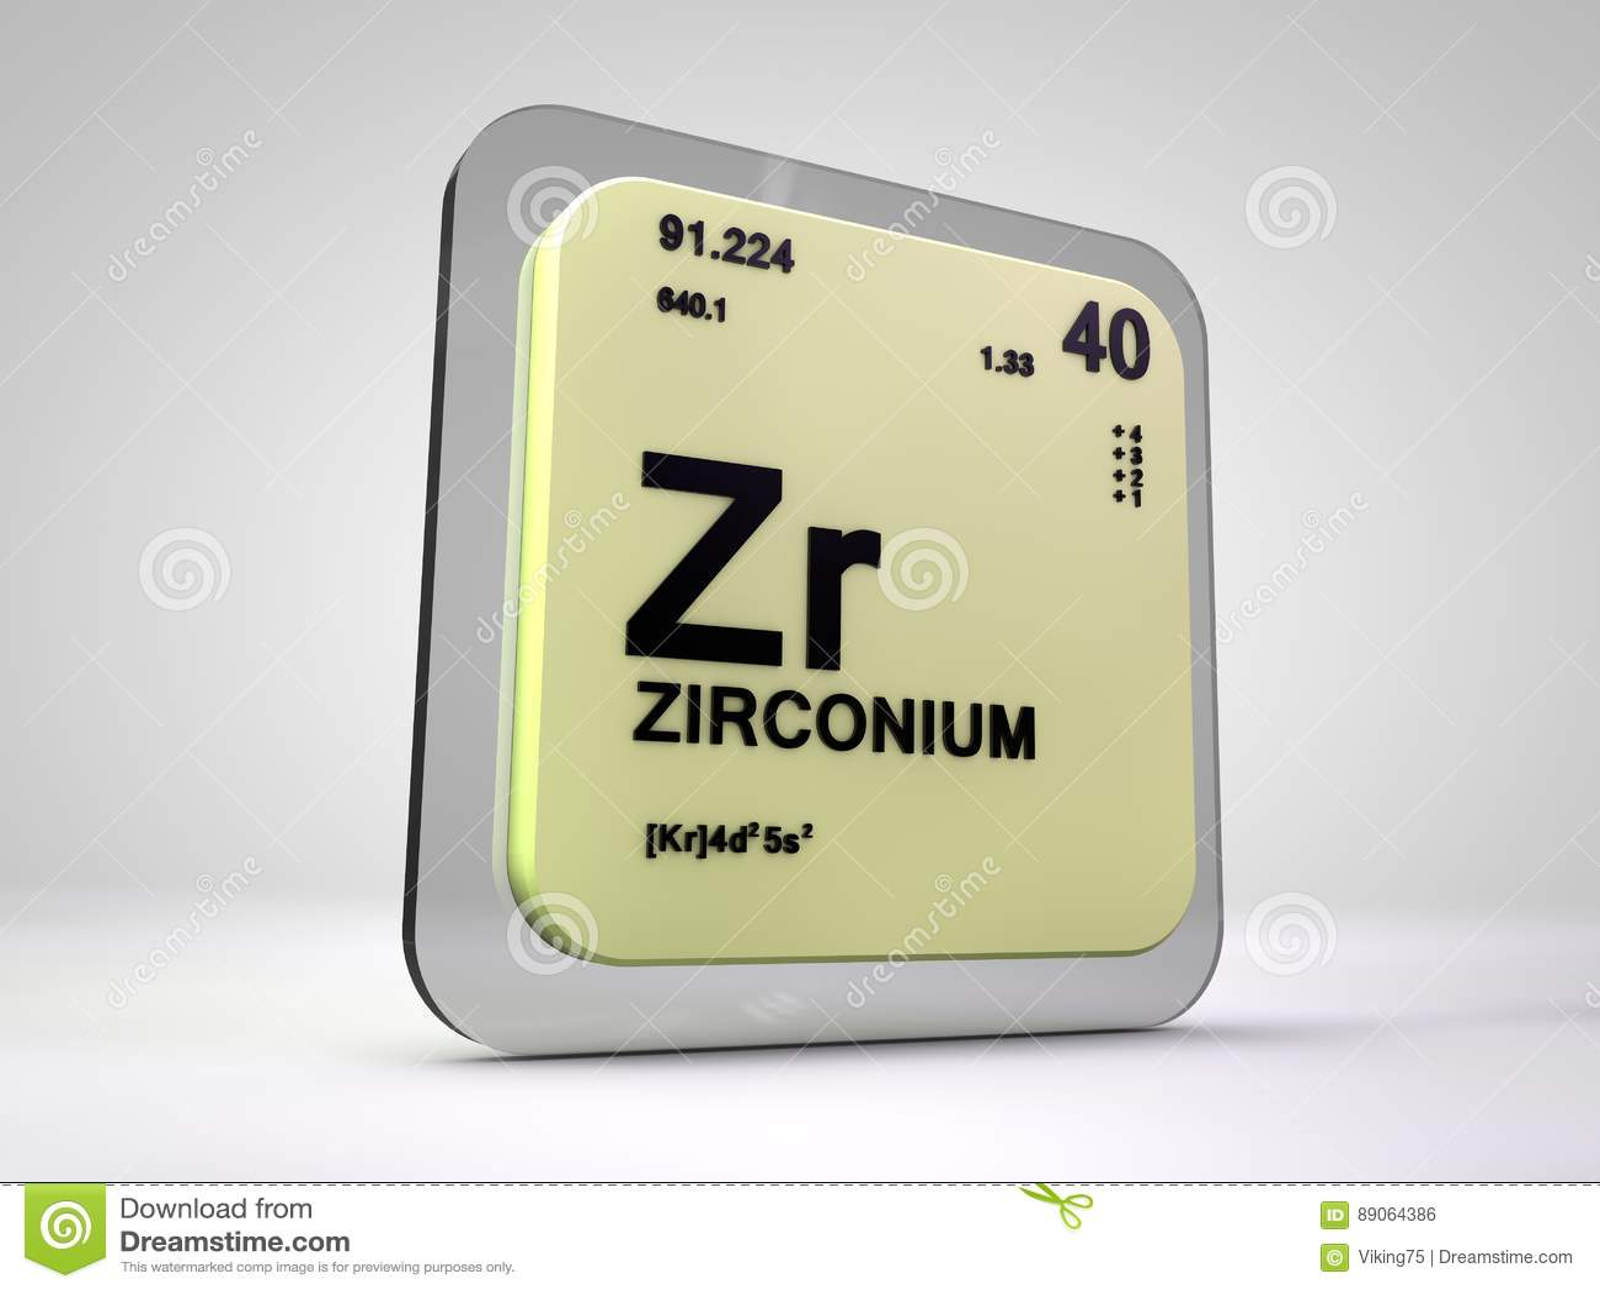 Circonio zr tabla peridica del elemento qumico stock de download circonio zr tabla peridica del elemento qumico stock de ilustracin ilustracin de urtaz Choice Image